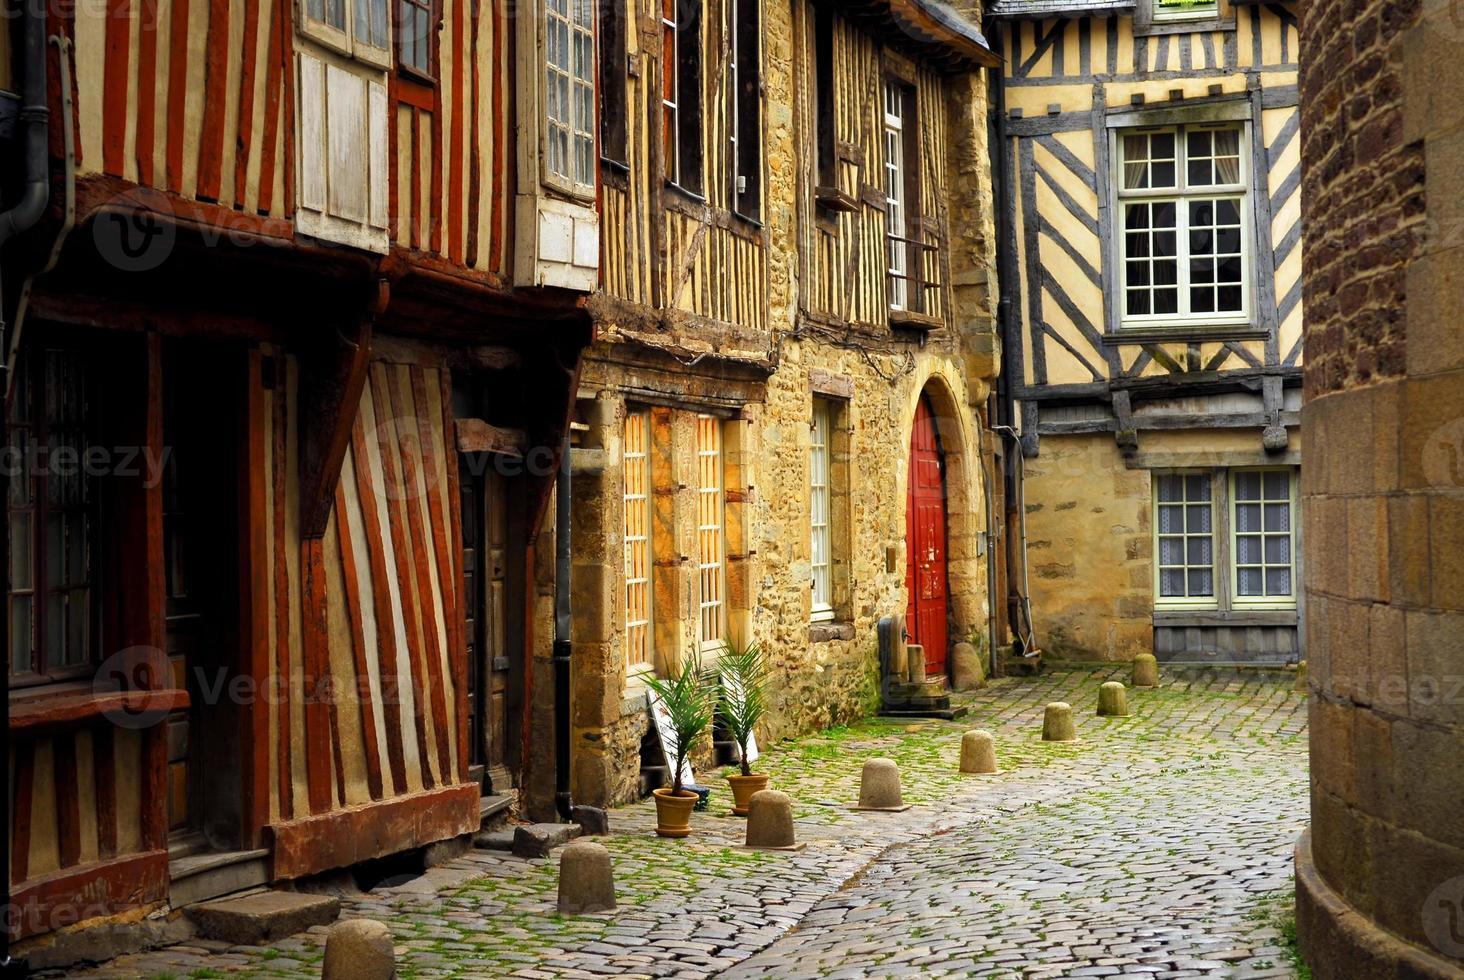 case medievali foto